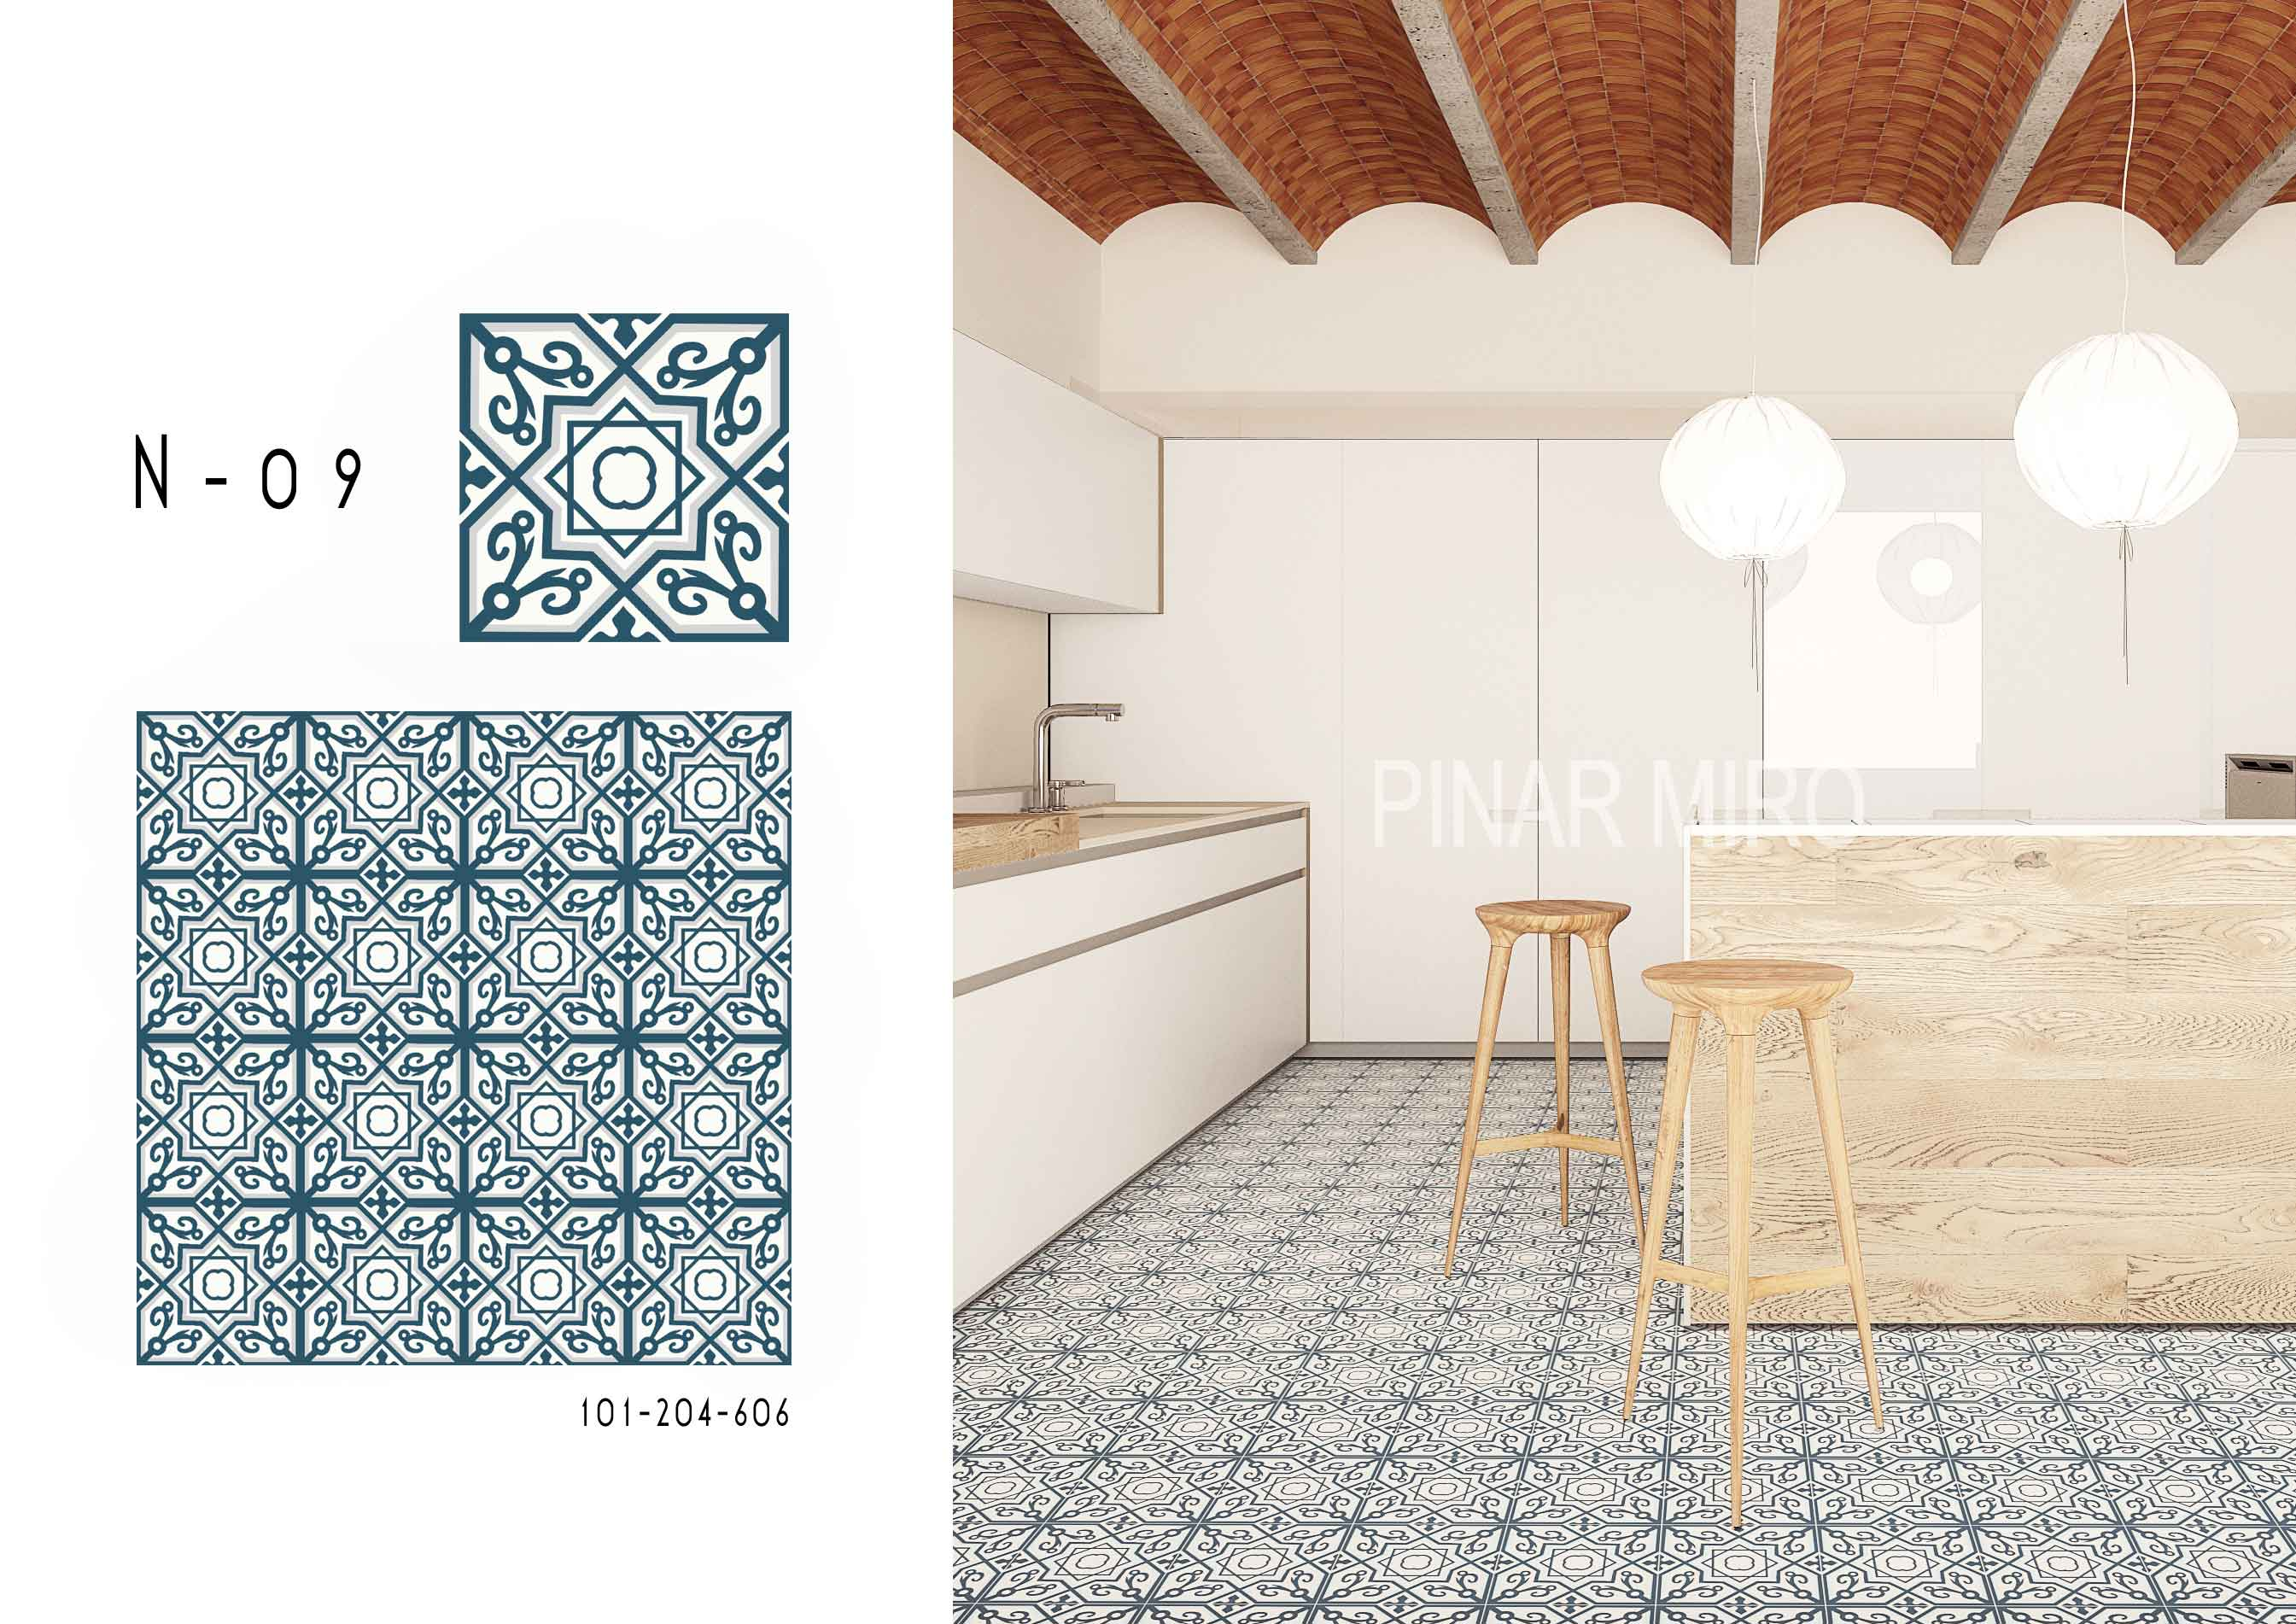 3-n09-pinar-miro-cement-tiles